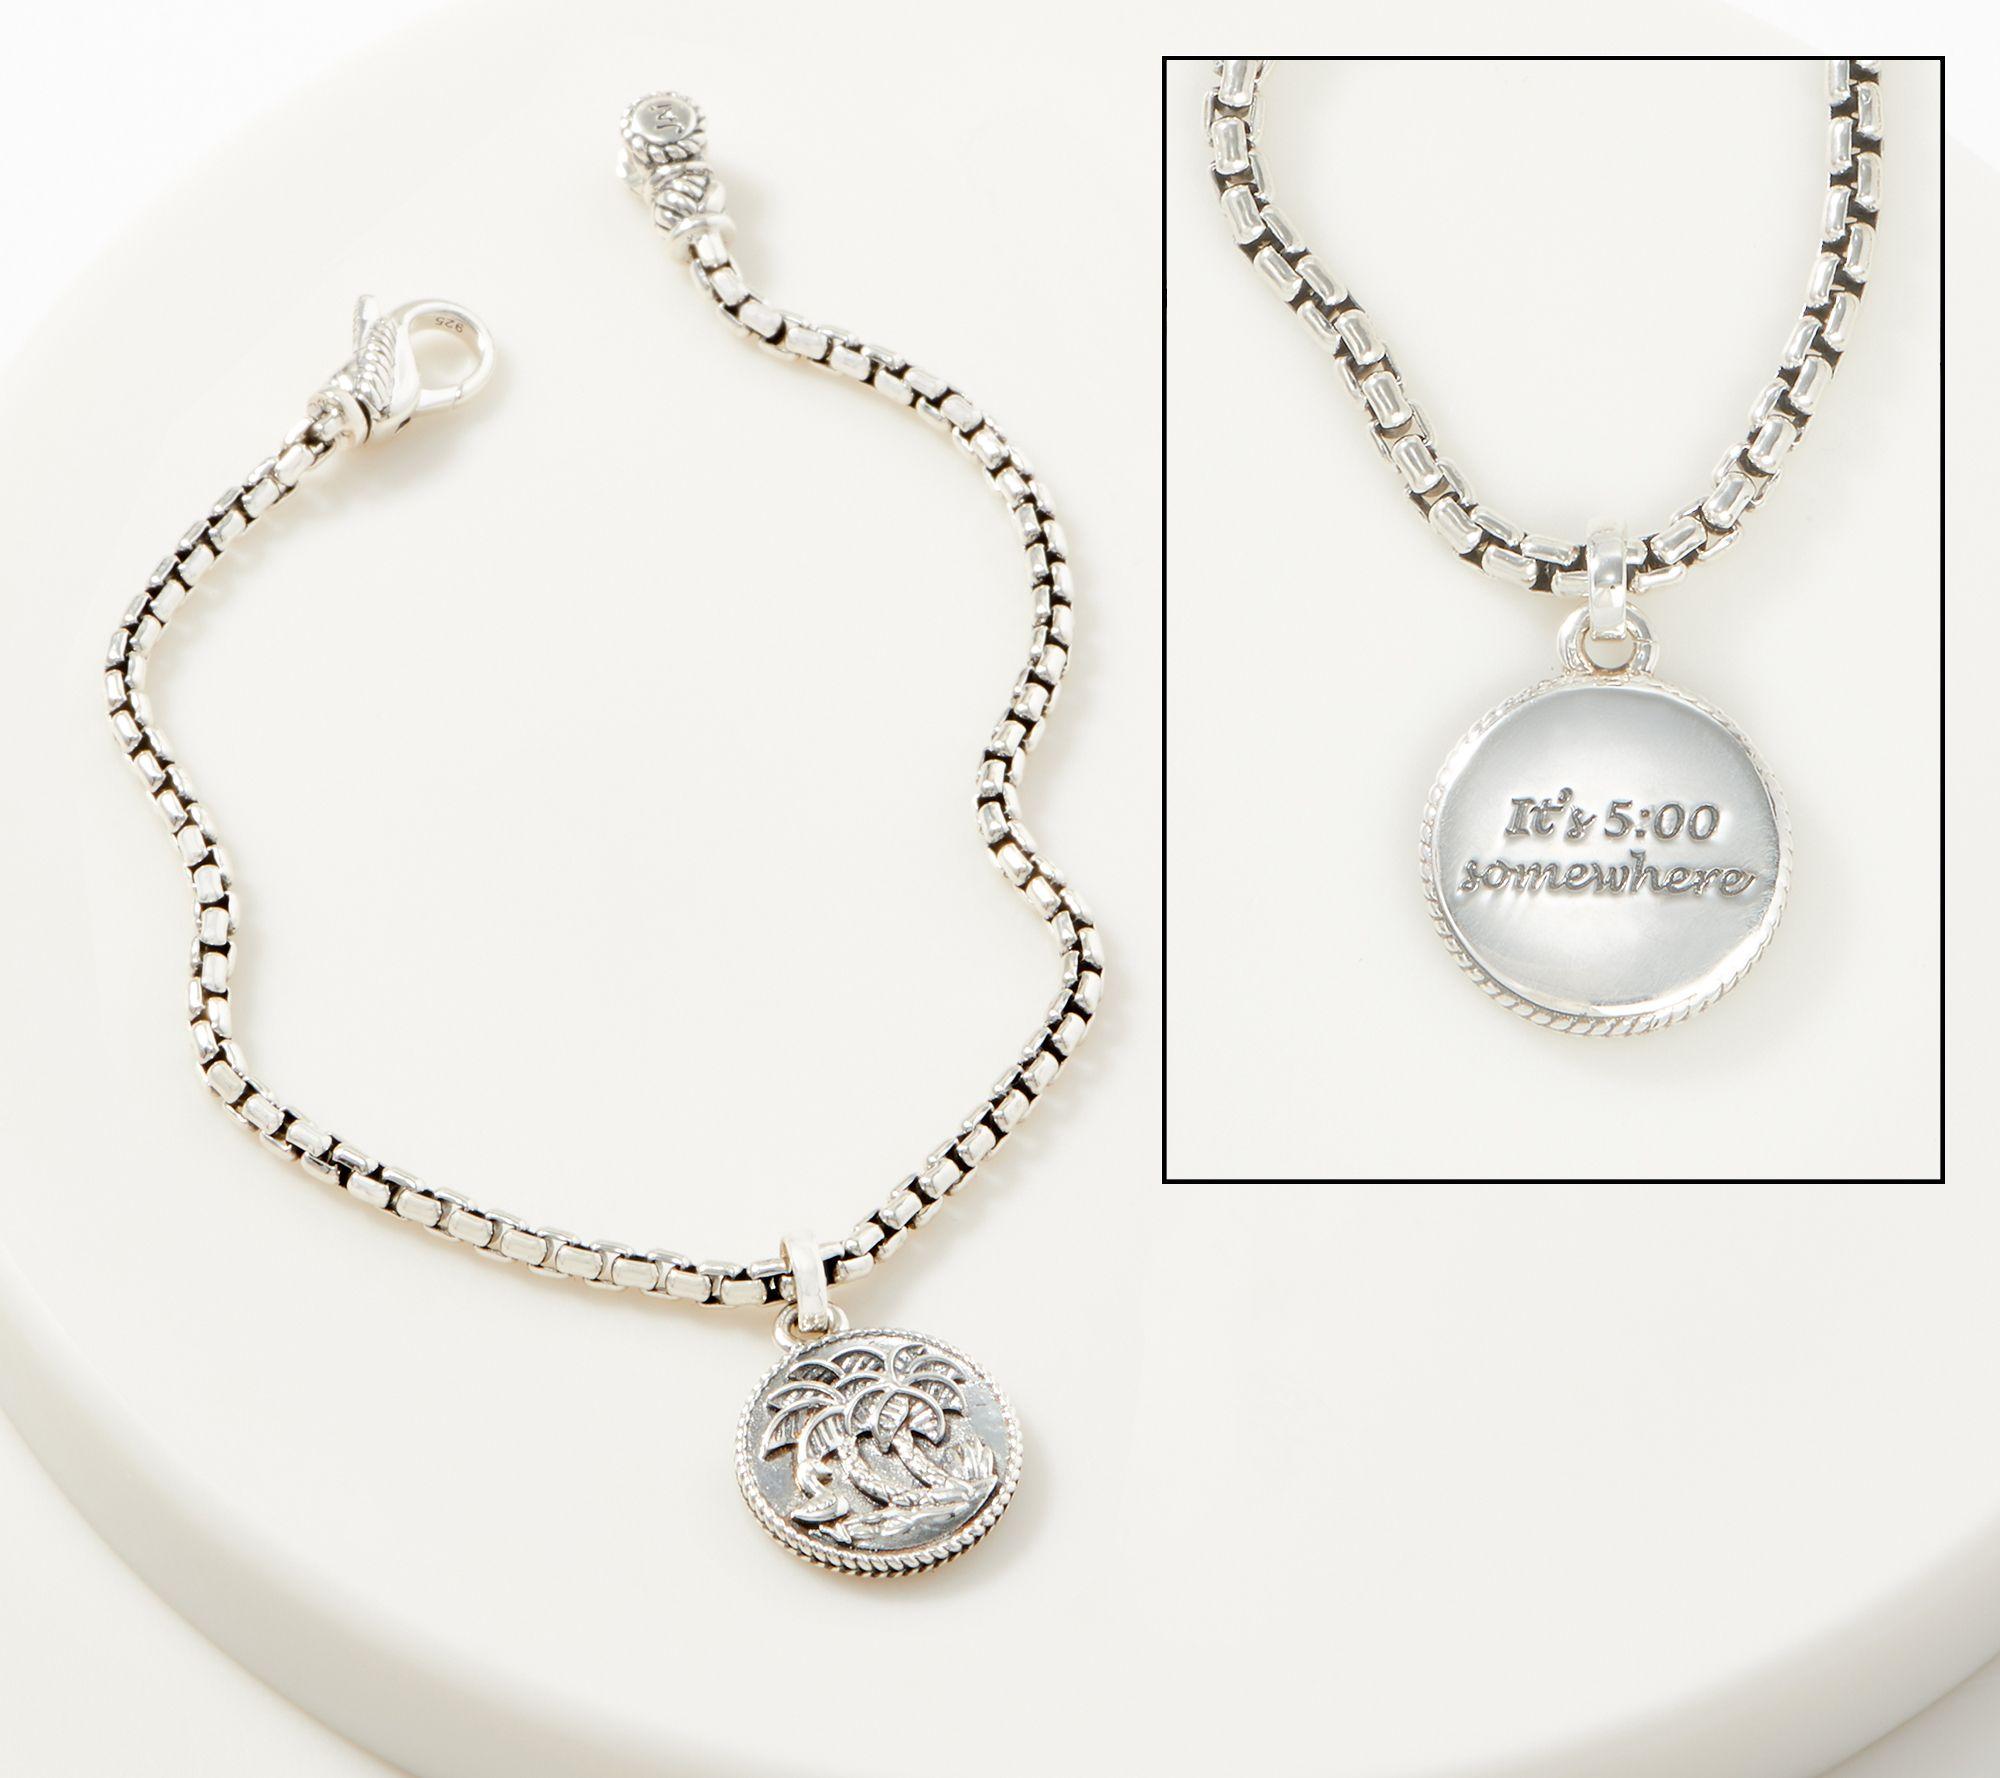 1b614e798 JAI Sterling Silver 2.7mm Box Chain Charm Bracelet - Page 1 — QVC.com